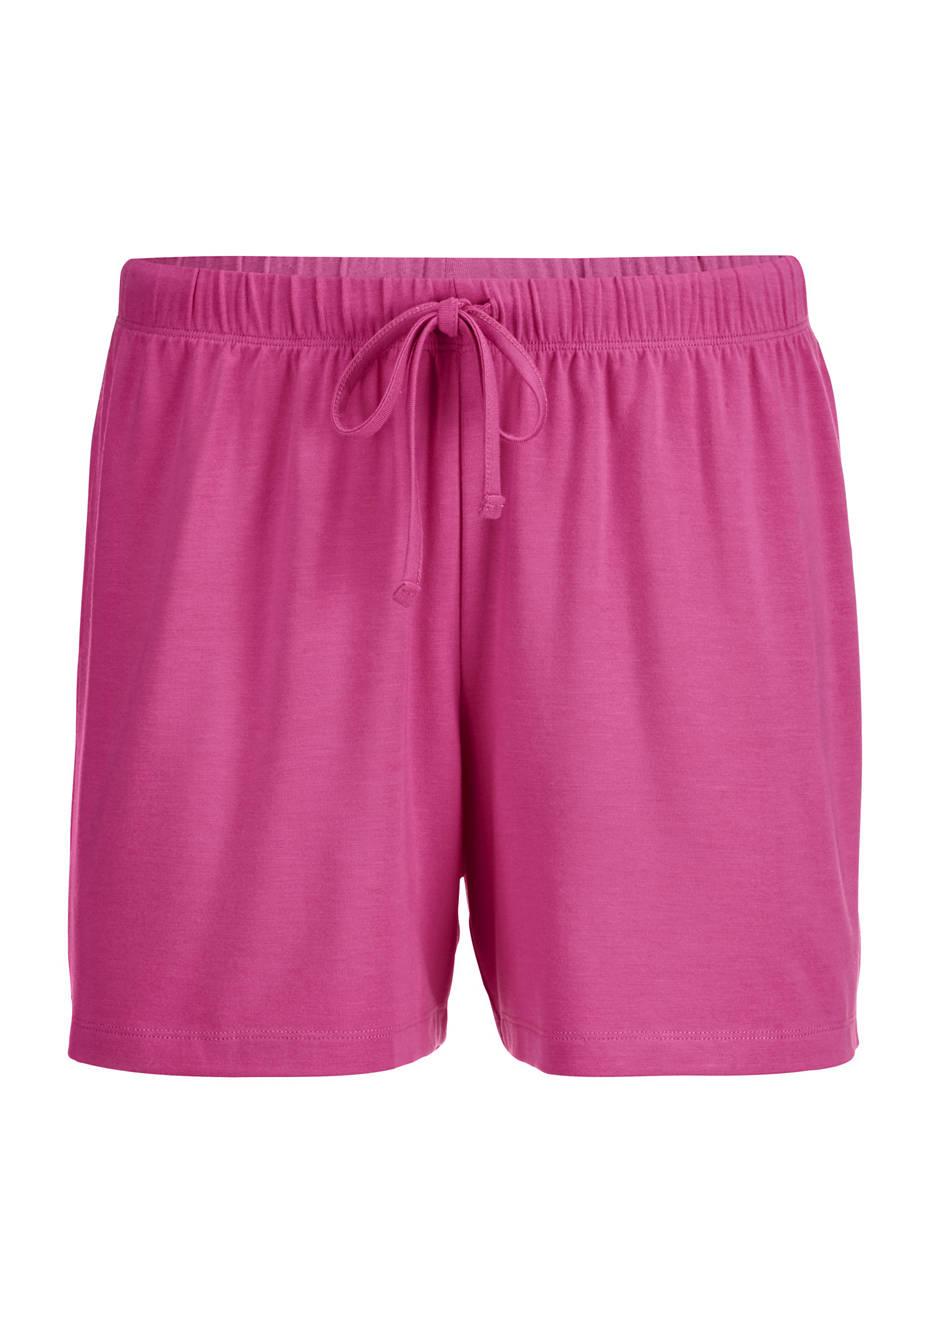 Short pants made of TENCEL ™ Modal